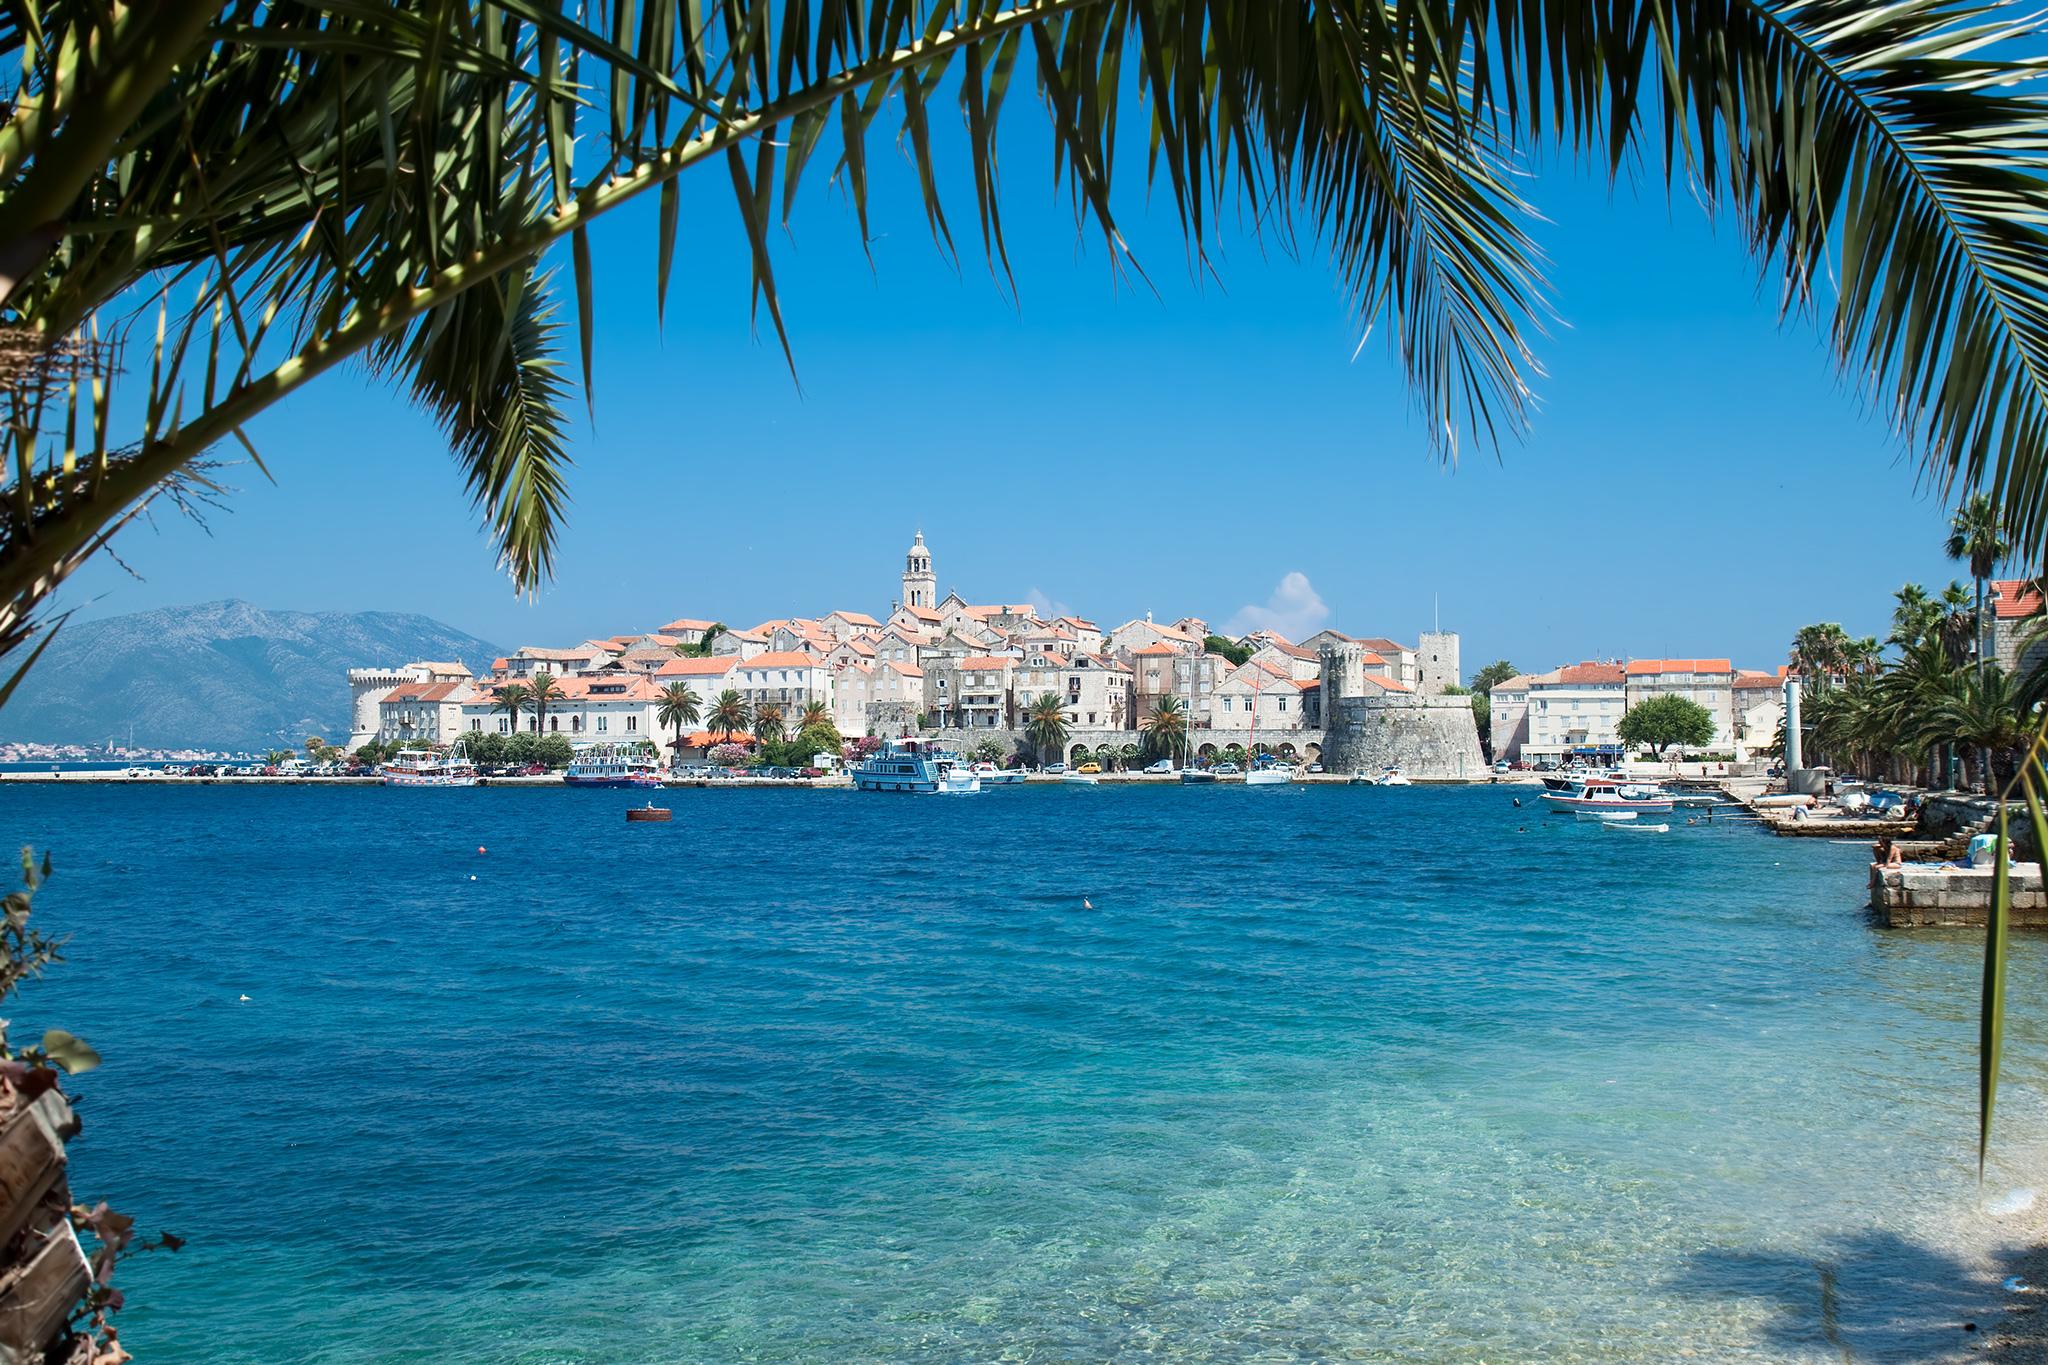 Korcula Dubrovnik Transat